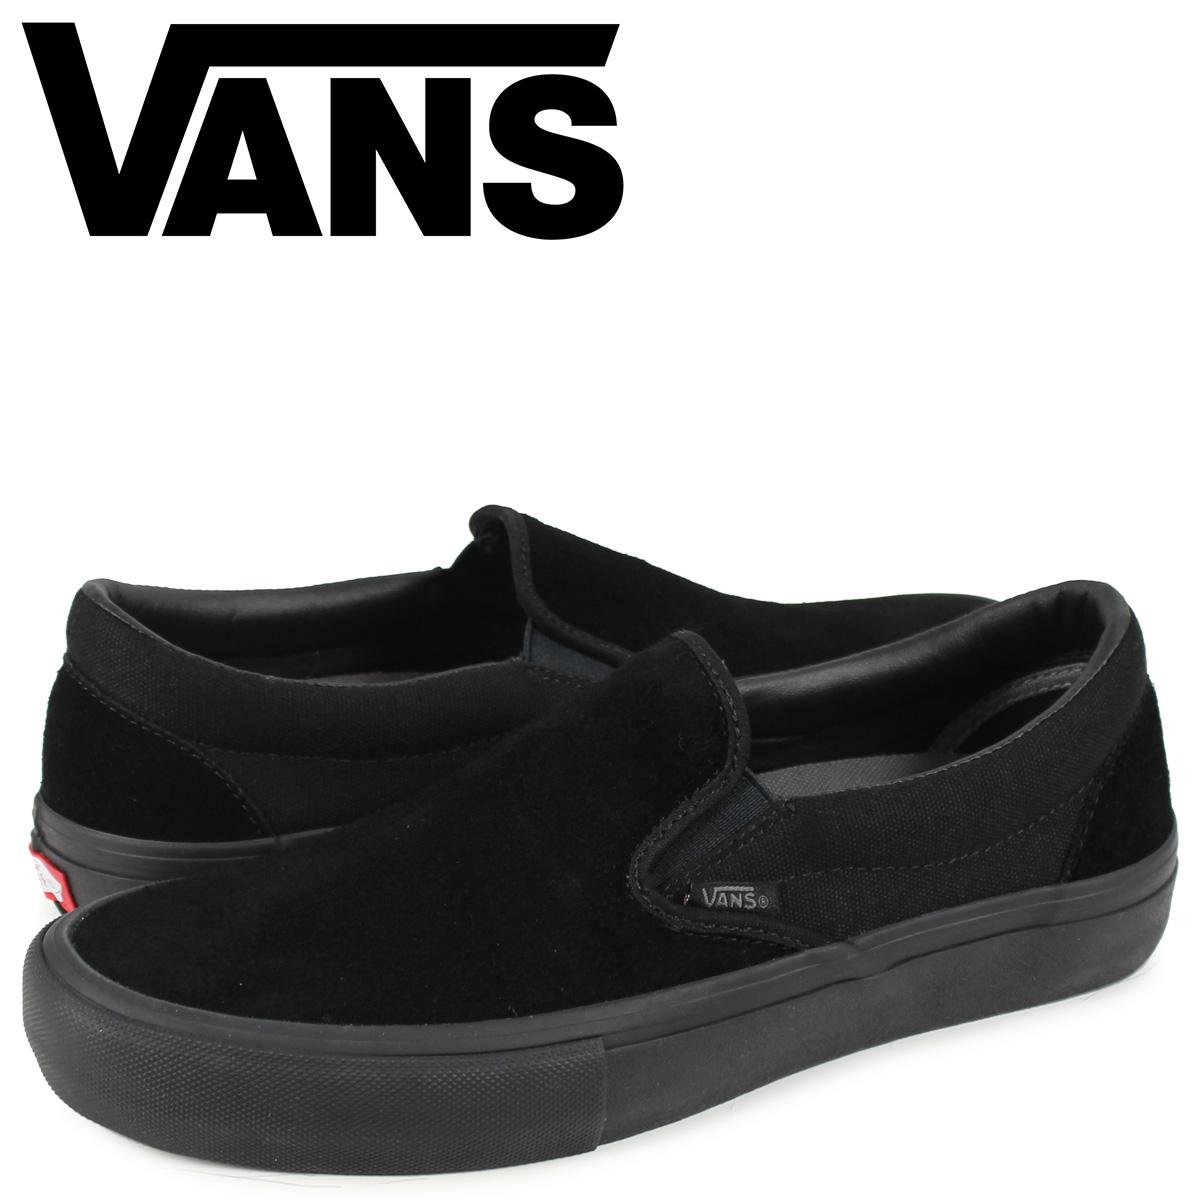 VANS ヴァンズ スリッポン スニーカー メンズ CLASSIC SLIP-ON ブラック 黒 VN00097M1OJ